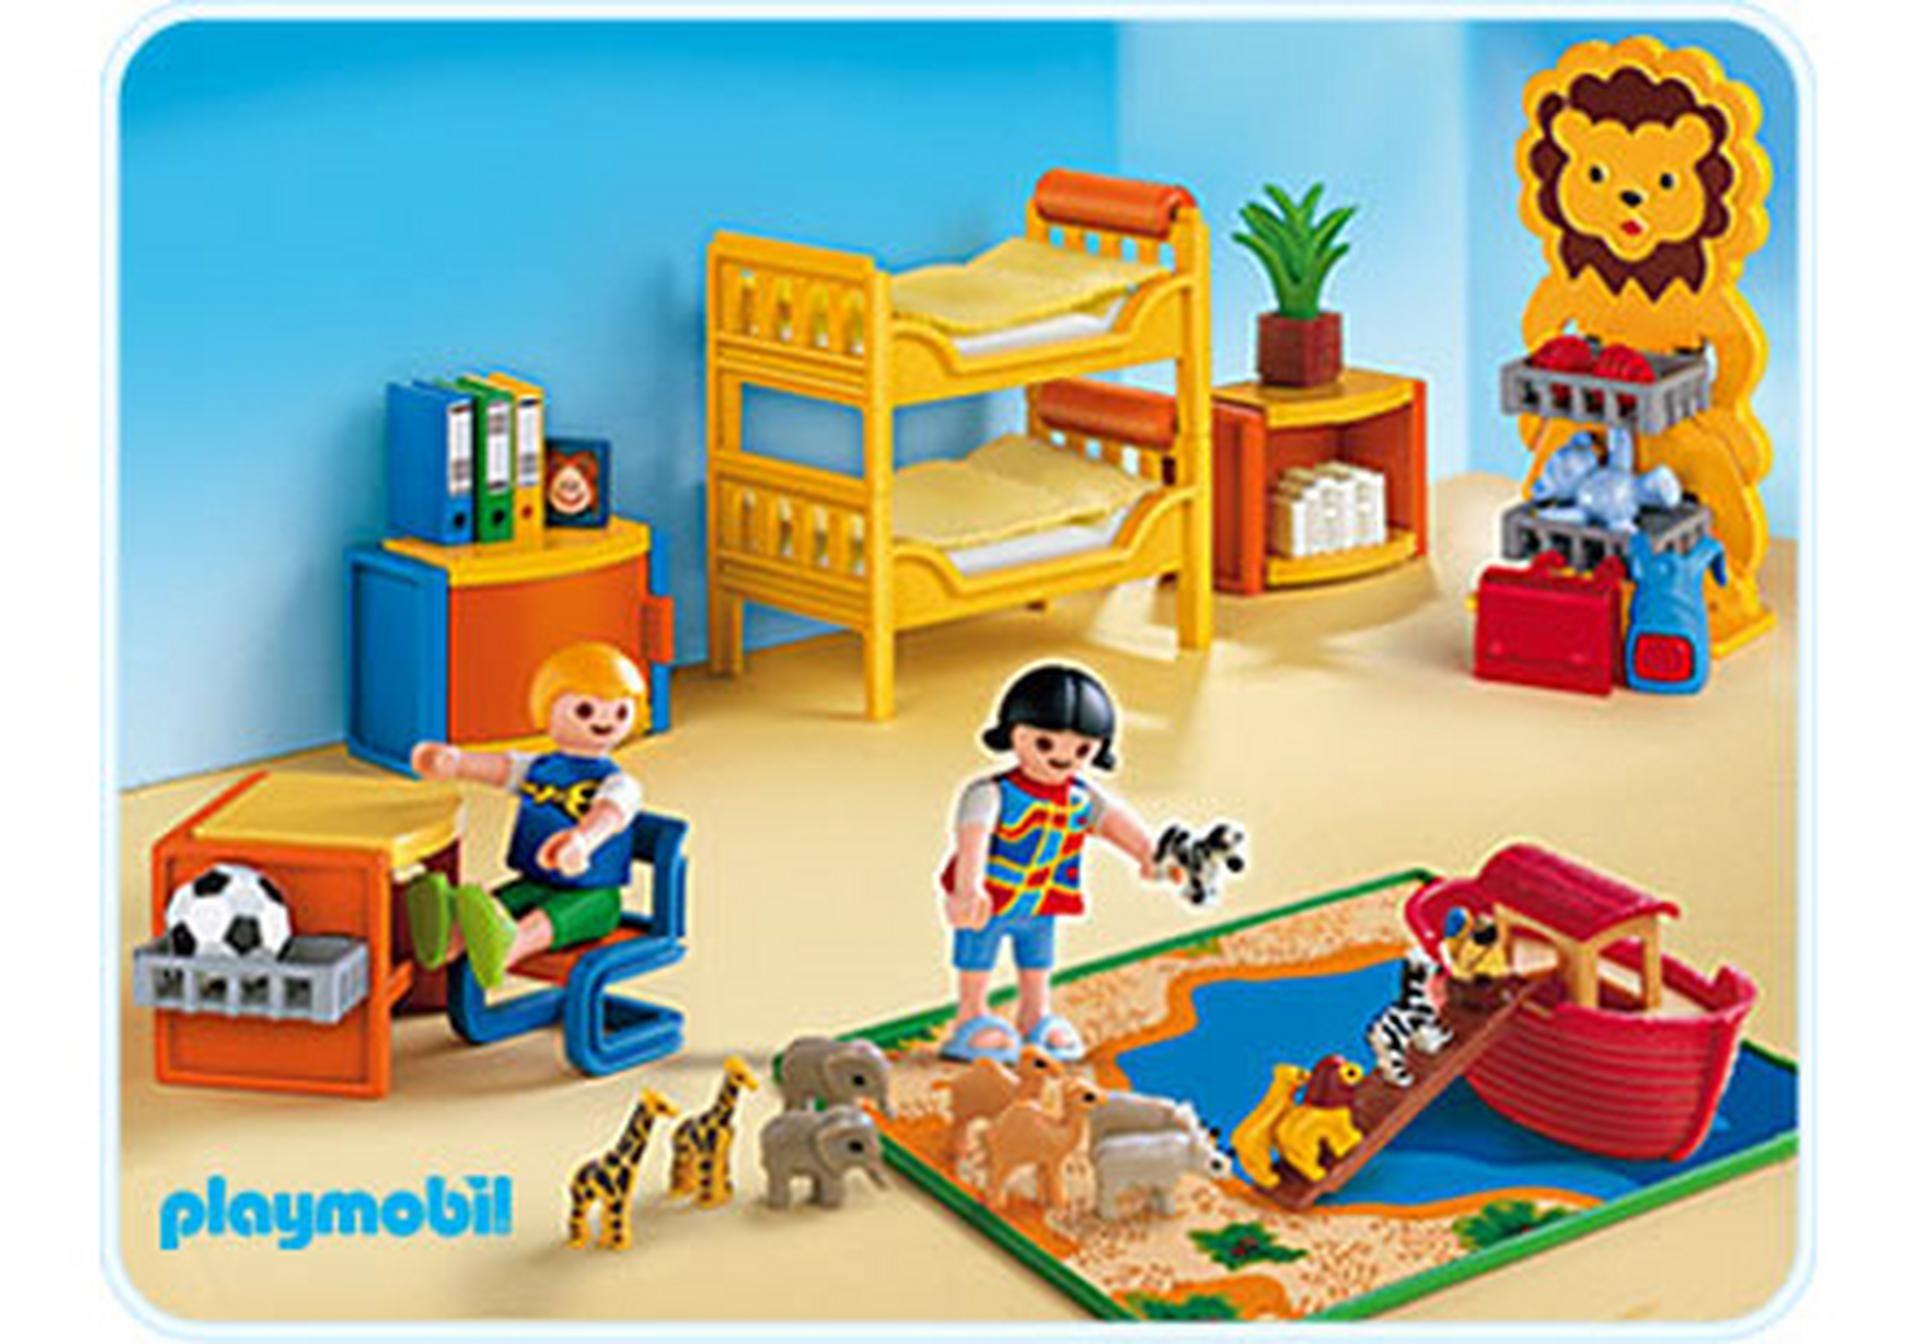 Playmobil 4287 - Kinderspielzimmer http://www.playmodb.org/cgi-bin ...